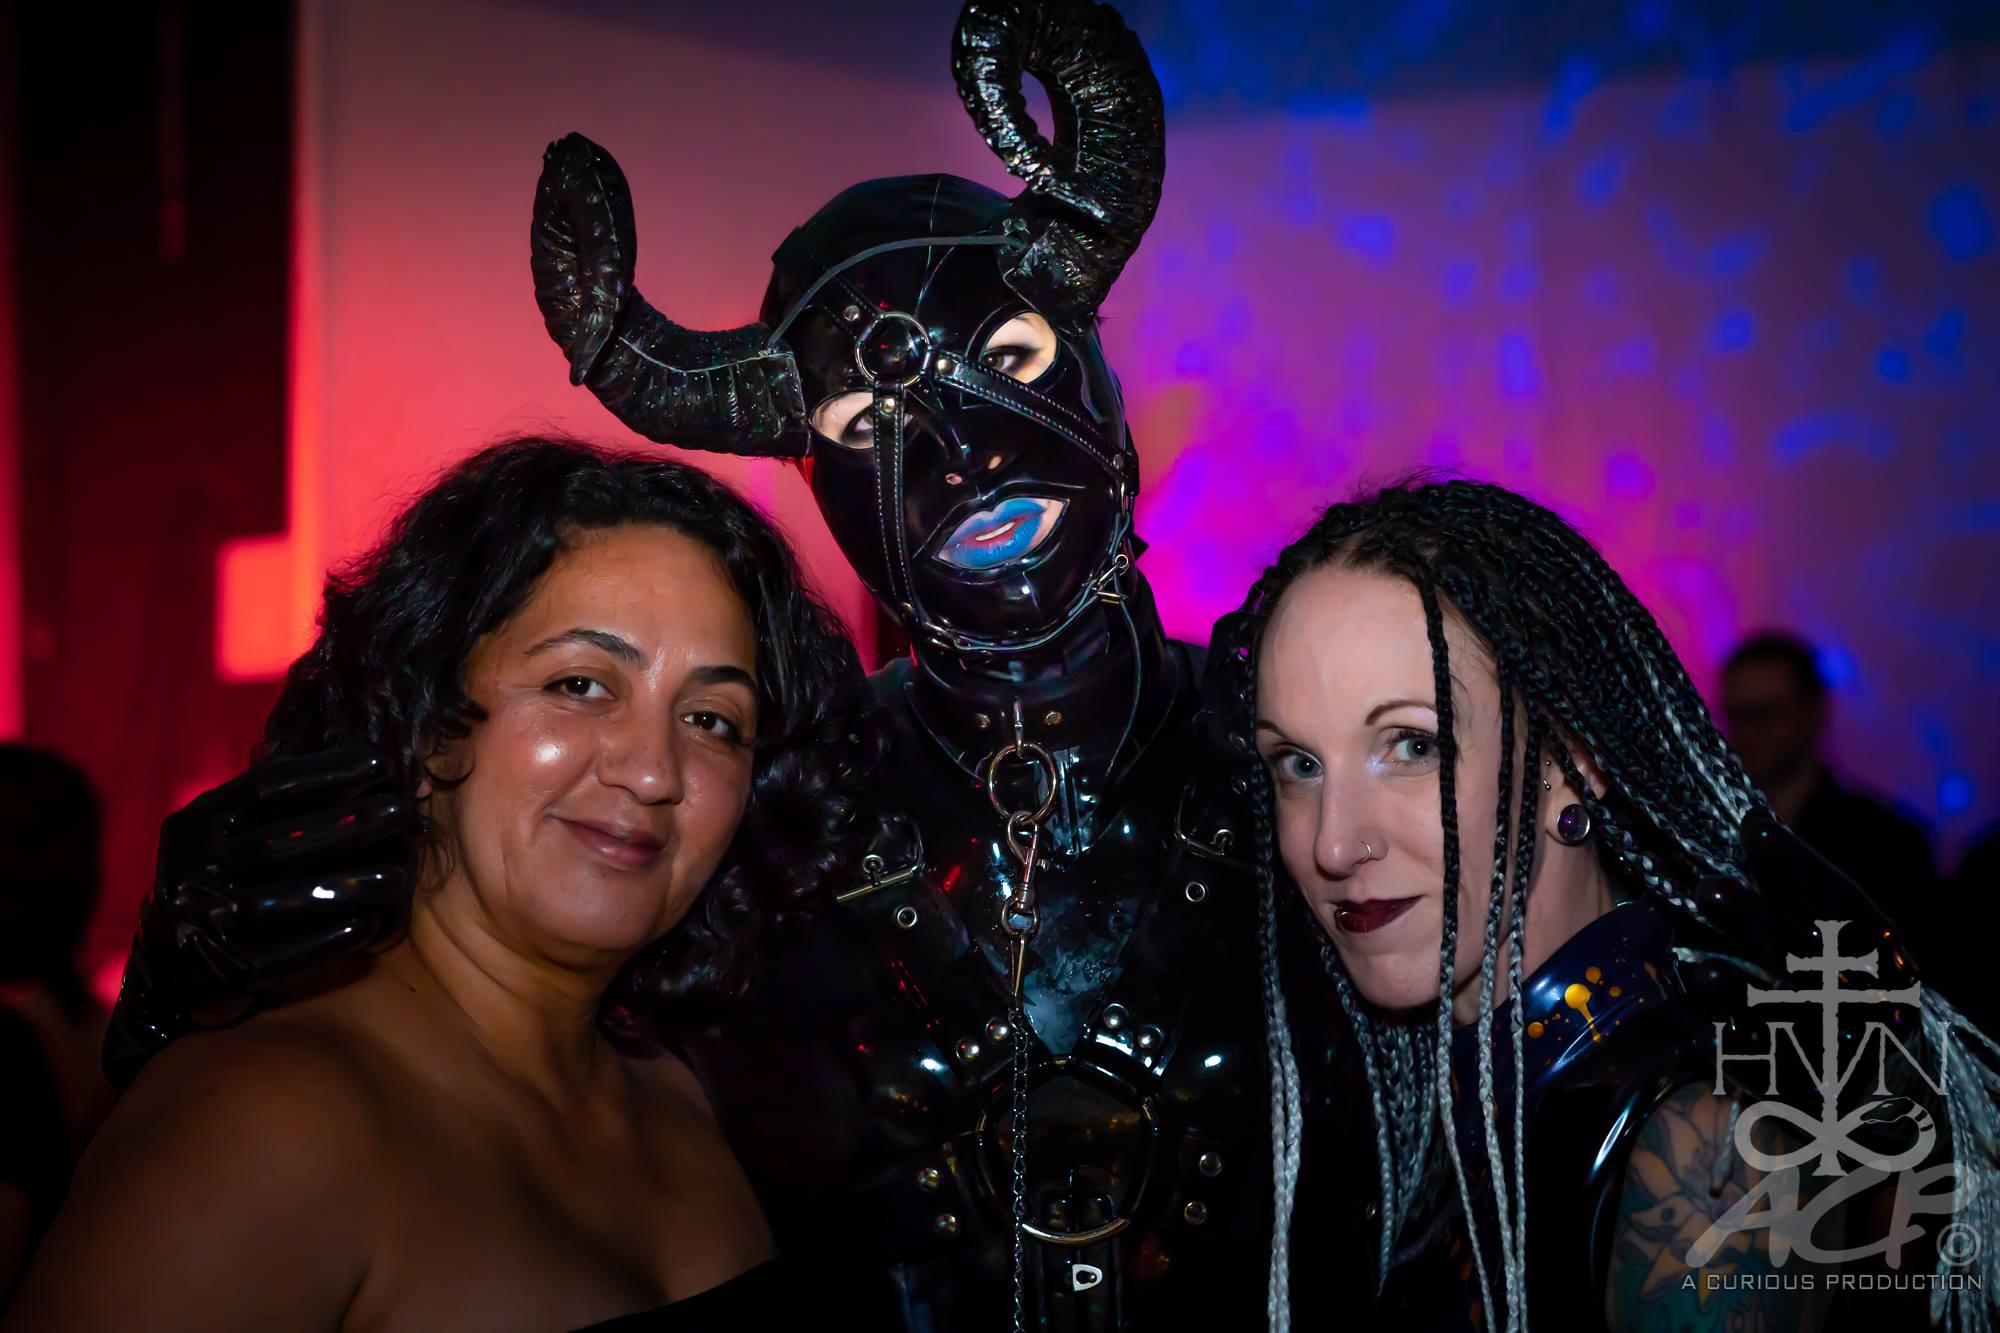 TheHavenClub-Goth-Industrial-Dance-Alternative-Northampton-MA-Exotic Erotic 2018 (7).jpg